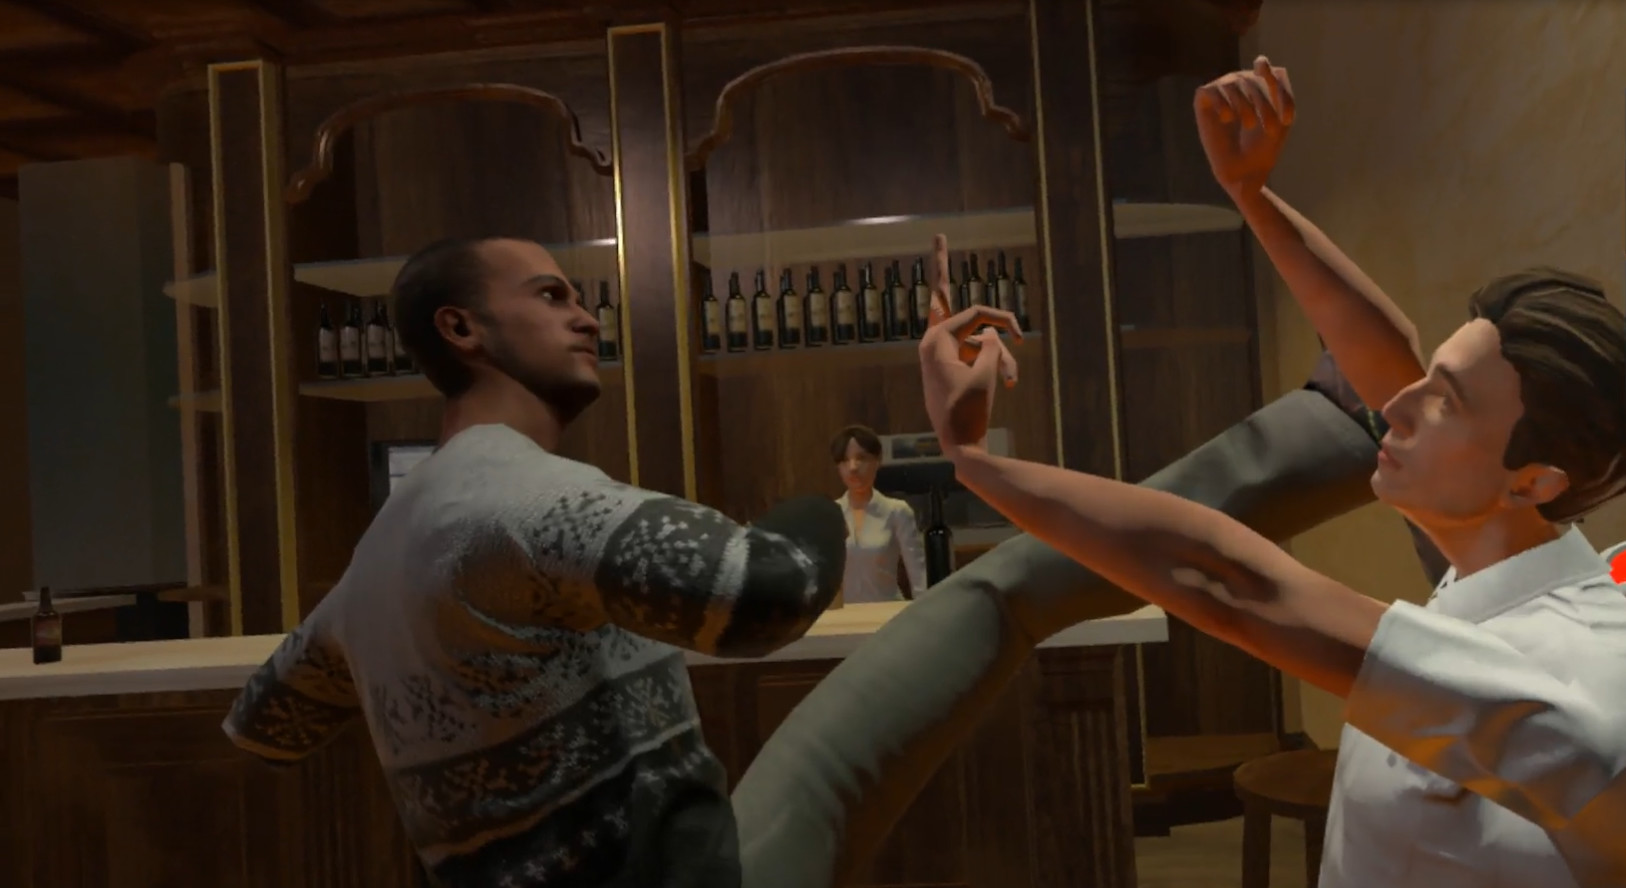 Drunkn-Bar-Fight-PlayStationVR